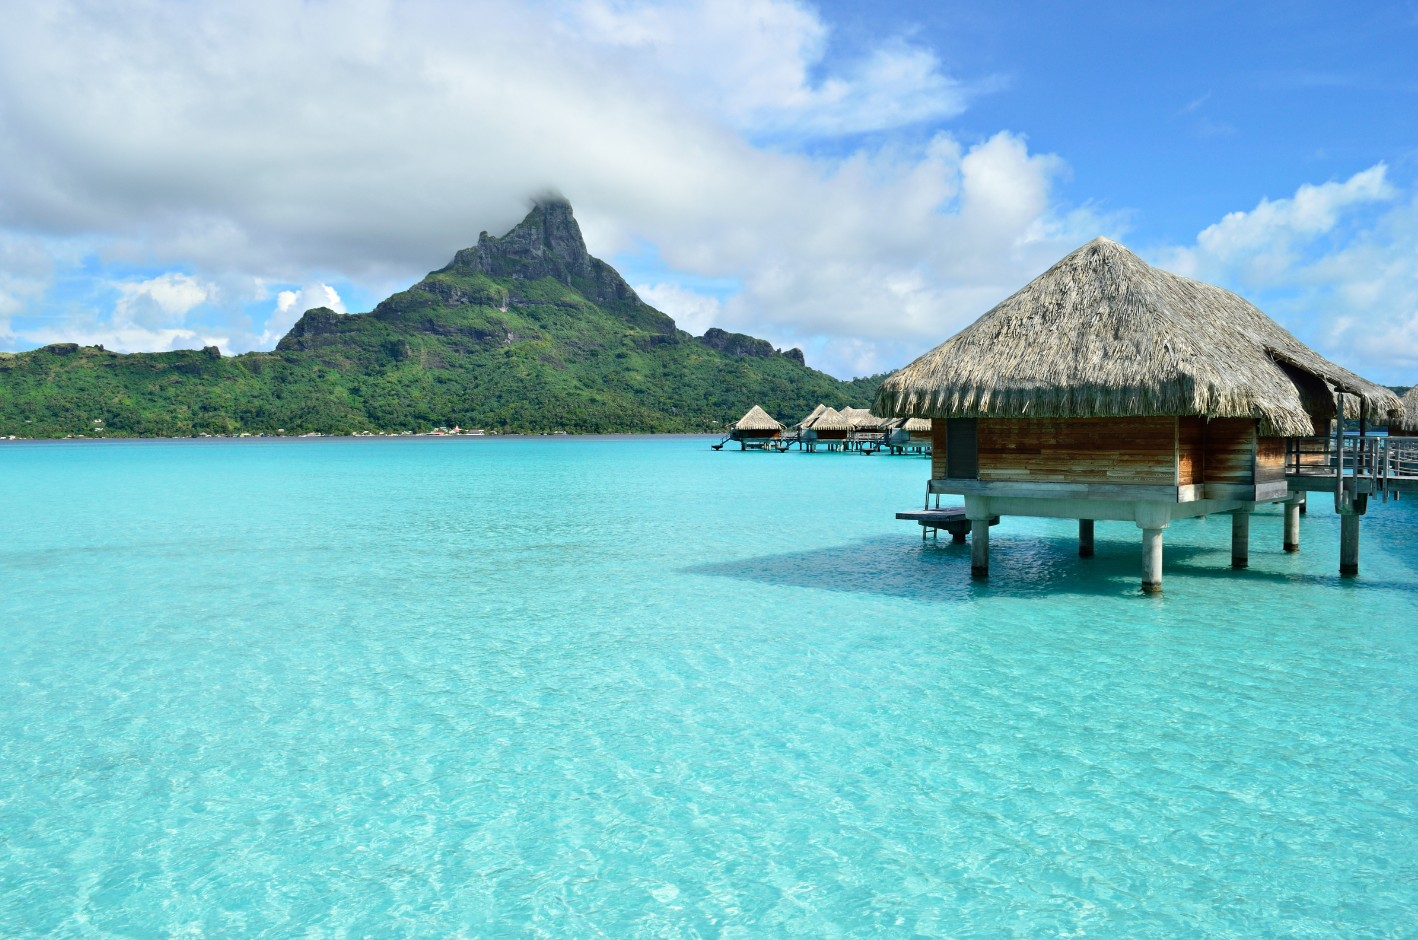 l'île de Bora Bora